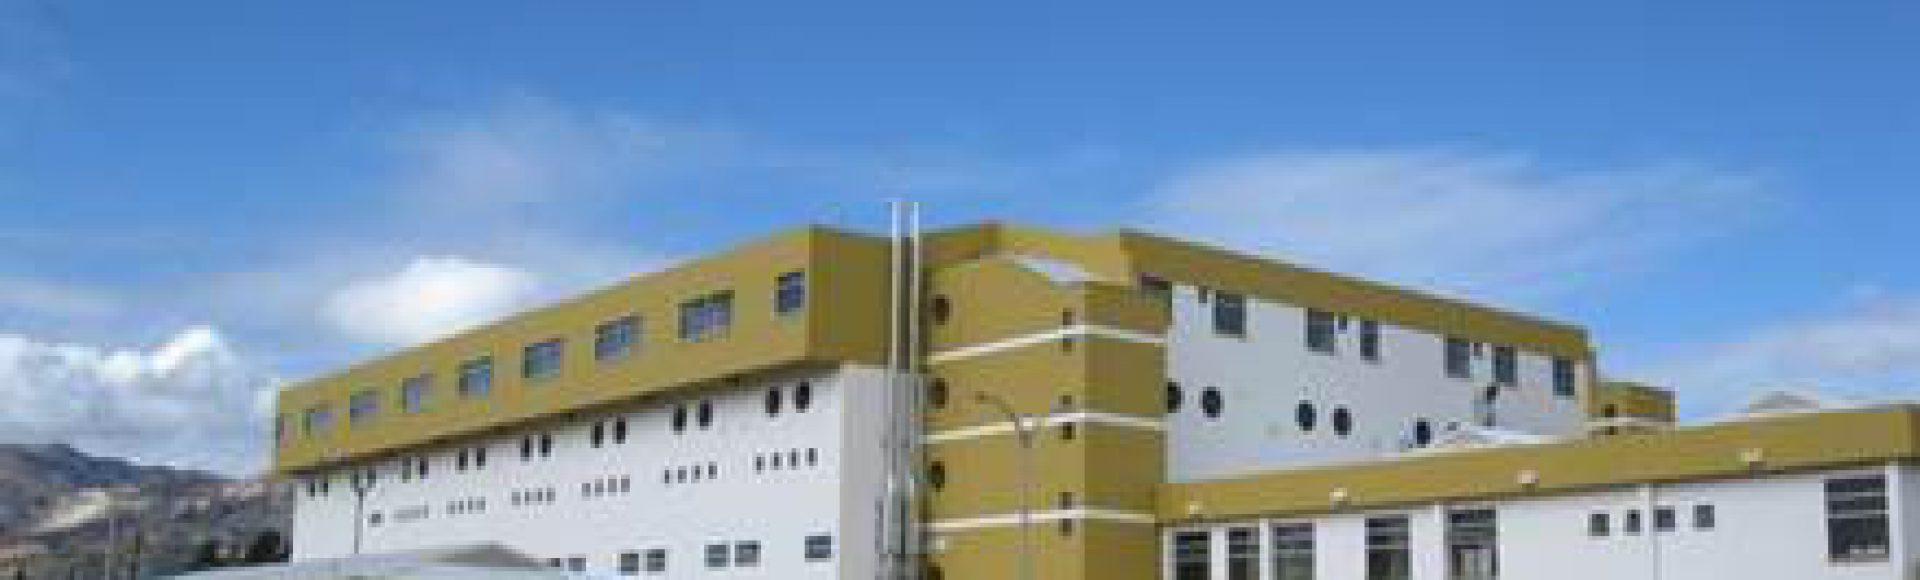 Hospital_JAEN